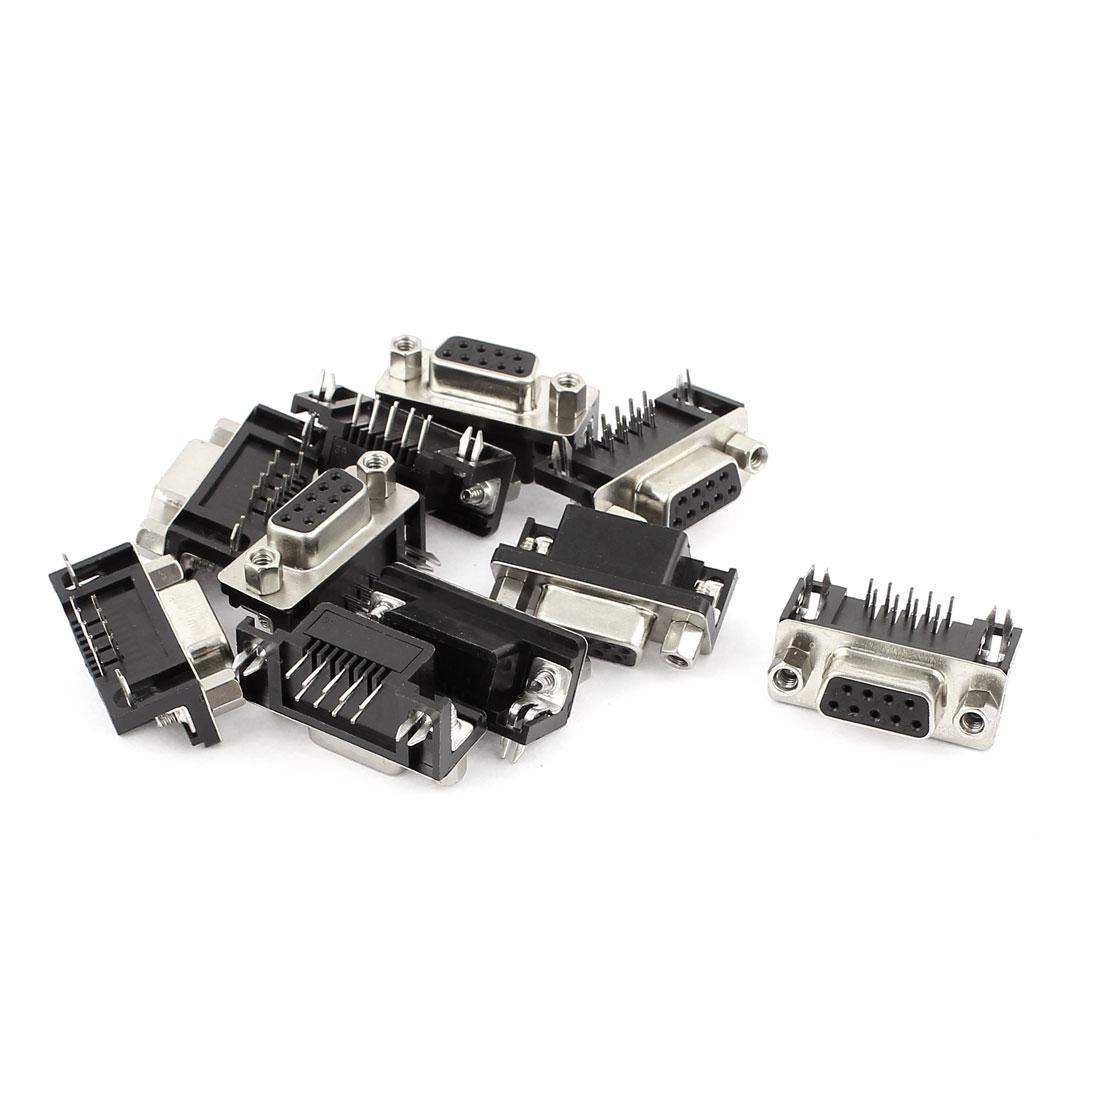 10 Pcs RS232 Serial 9pin Ports Solder Type DB9 Socket Jack Connector